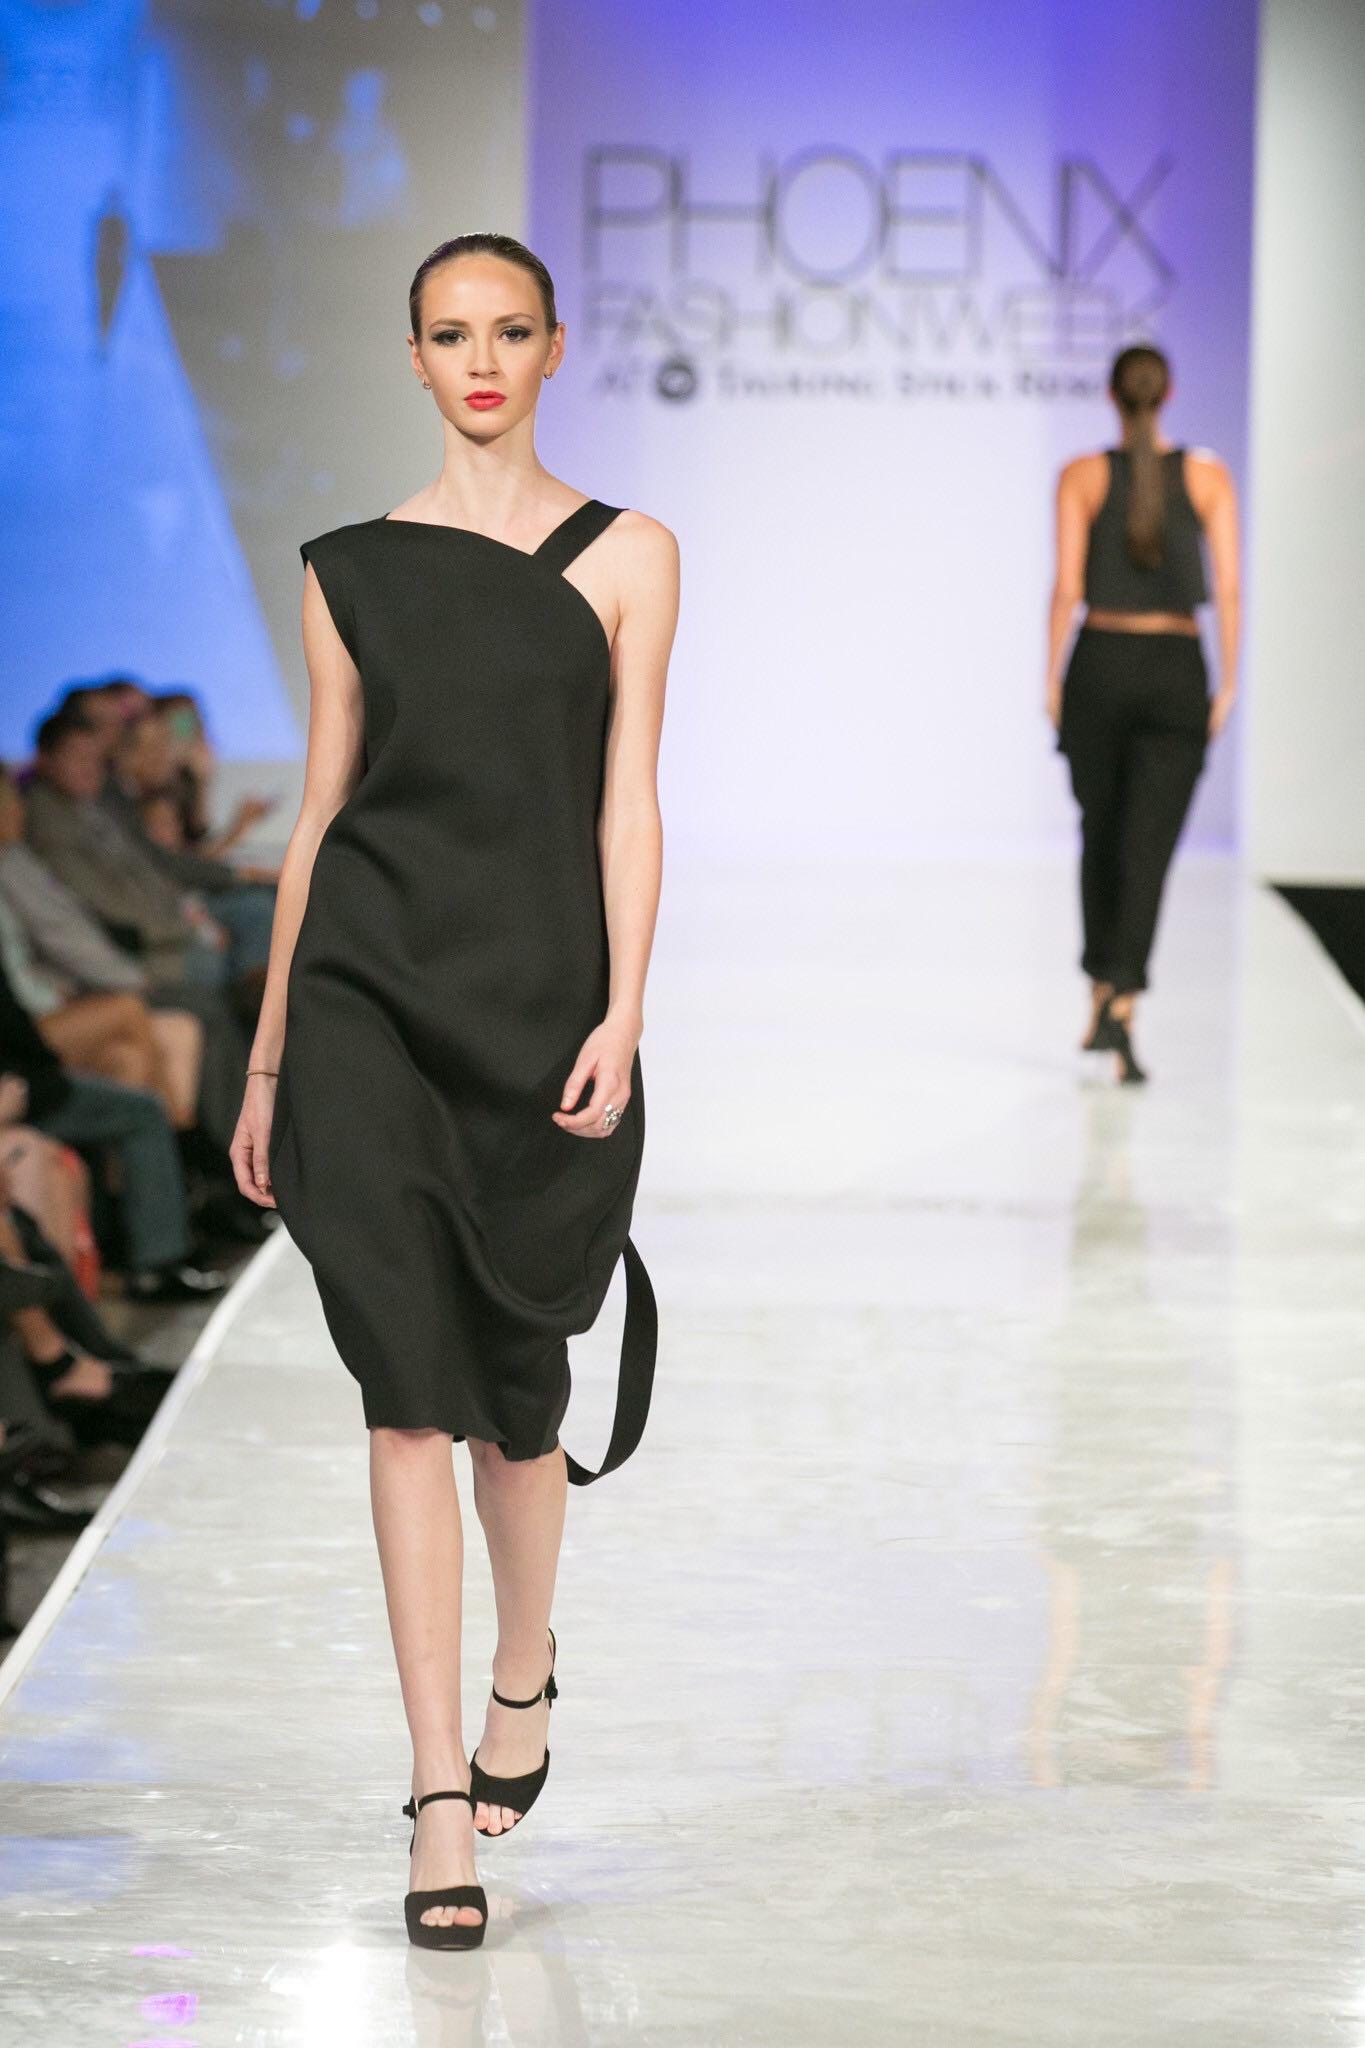 Alejandra Inzunza: Fabric and Structure - JAVA